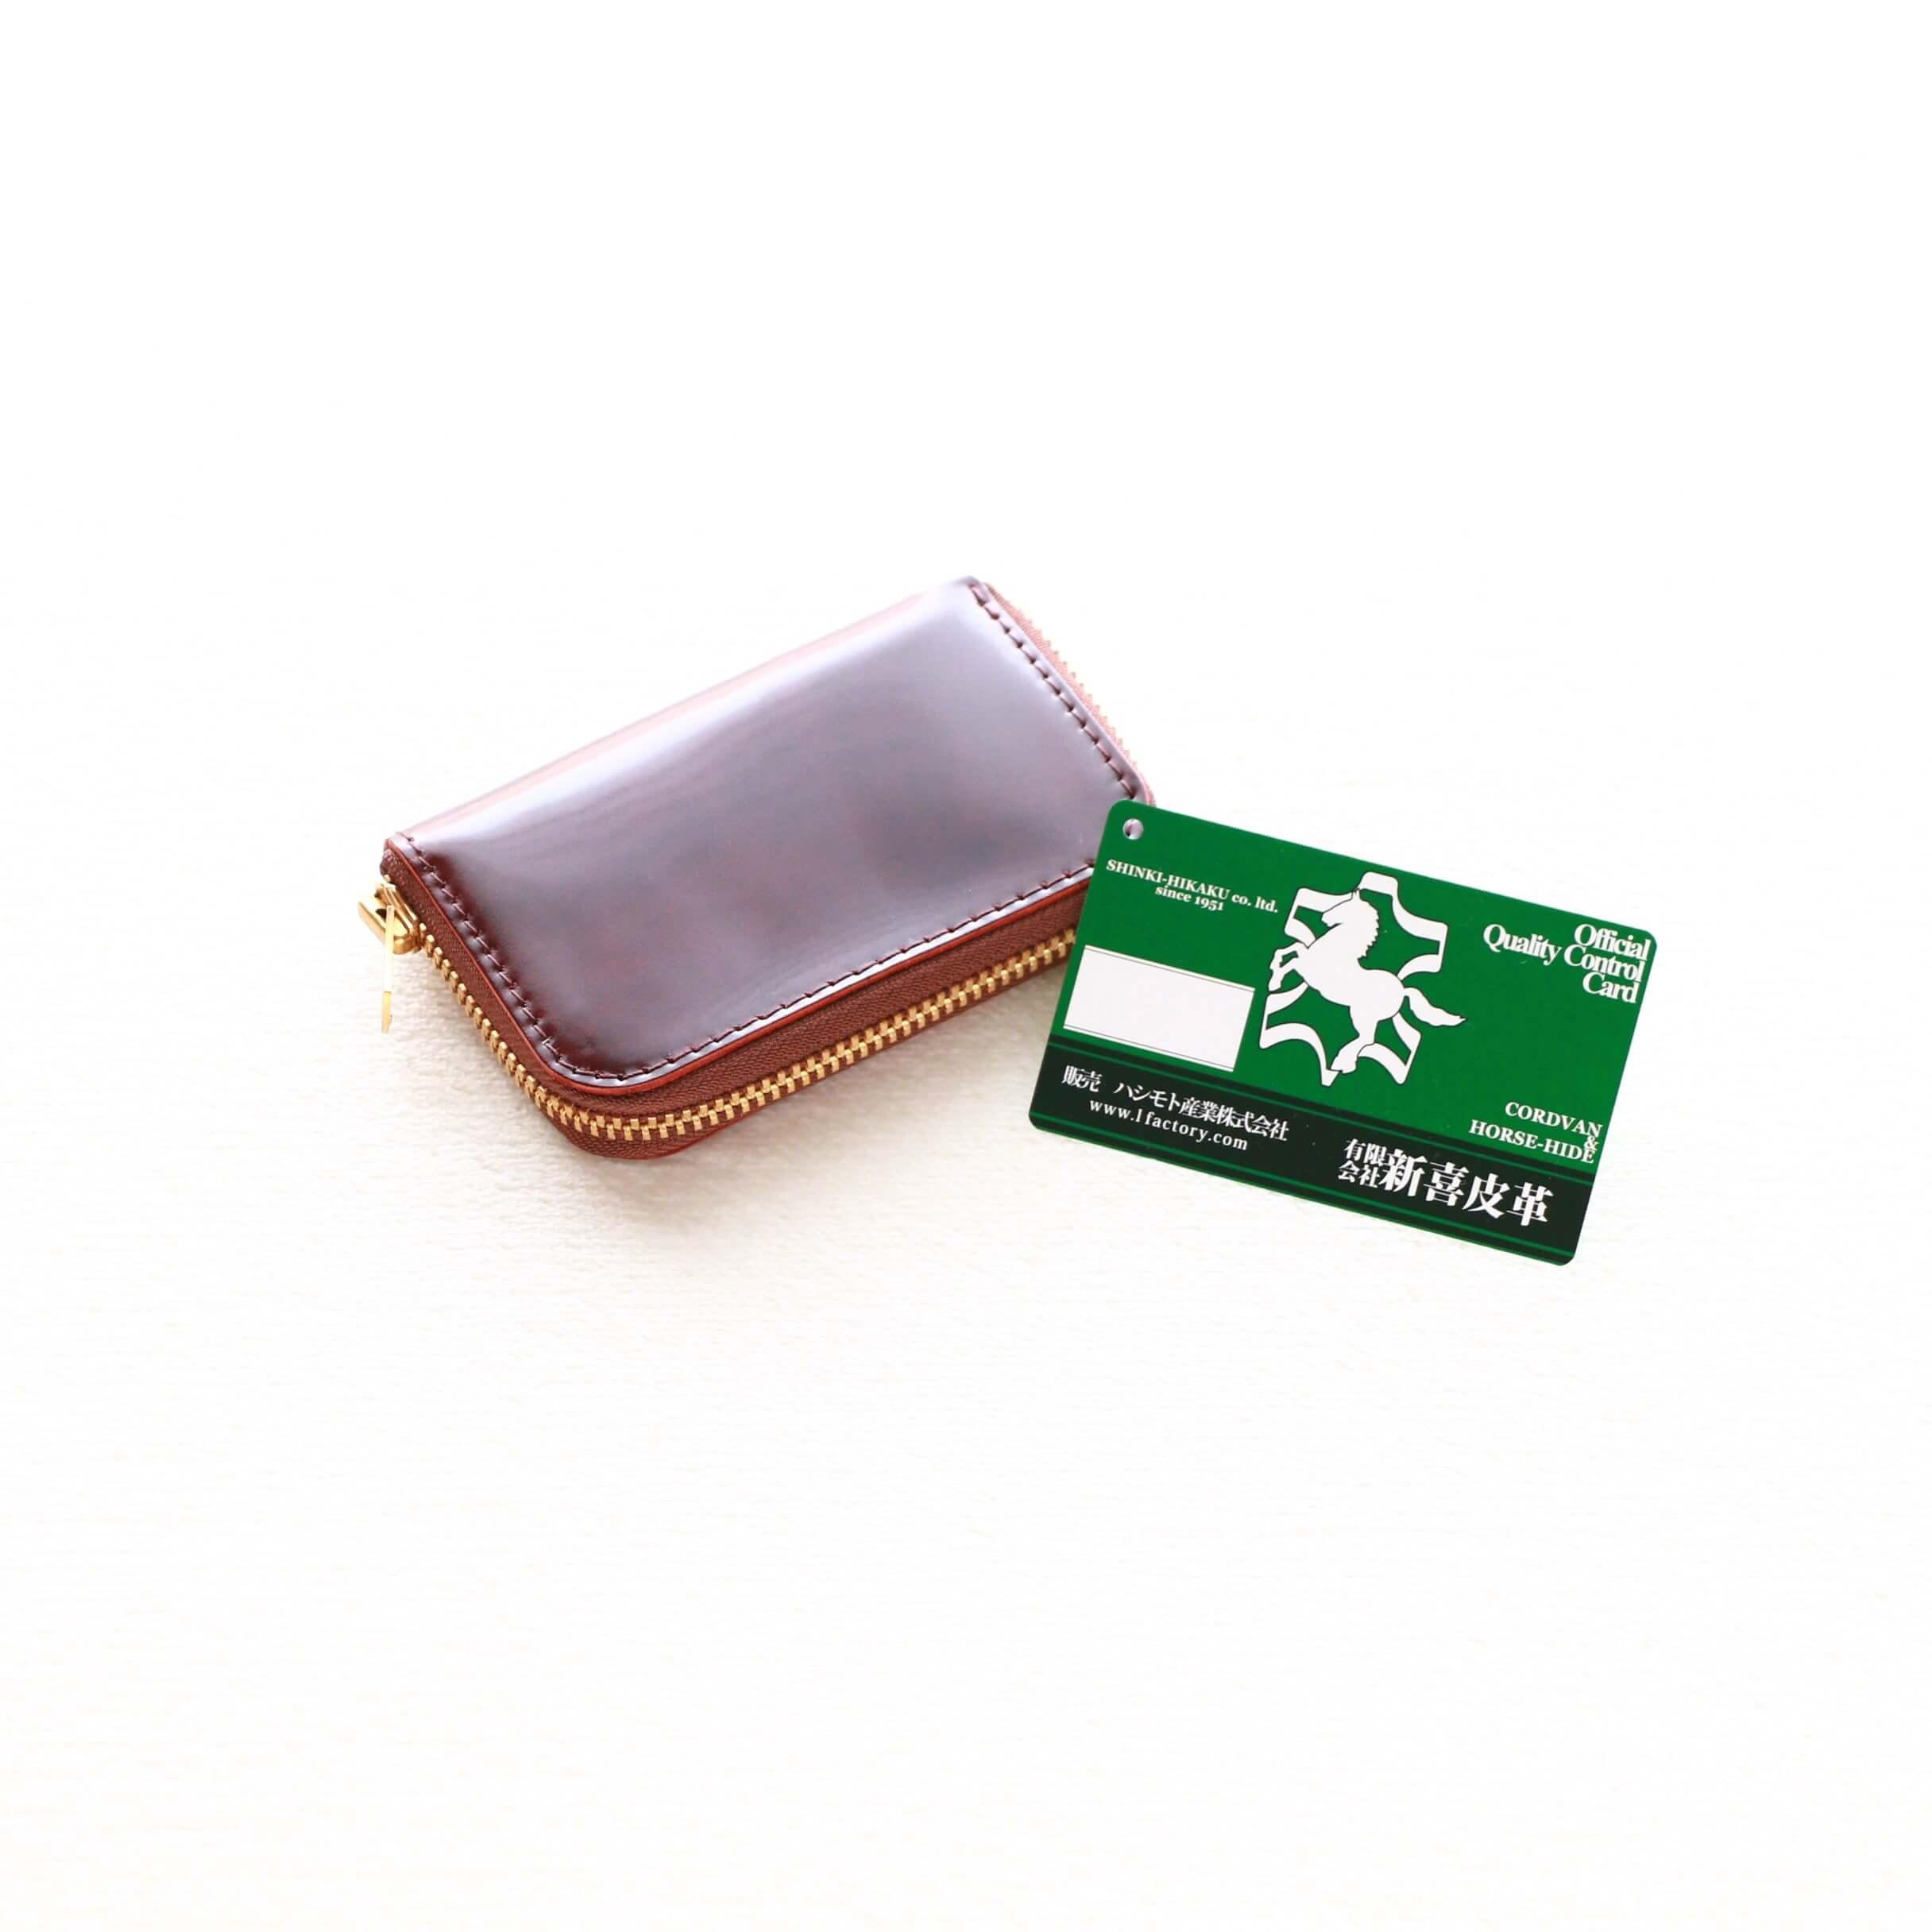 Master Hand マスターハンド Cordovan Round Zip Mini Wallet コードバン ラウンドジップ ミニ ウォレット